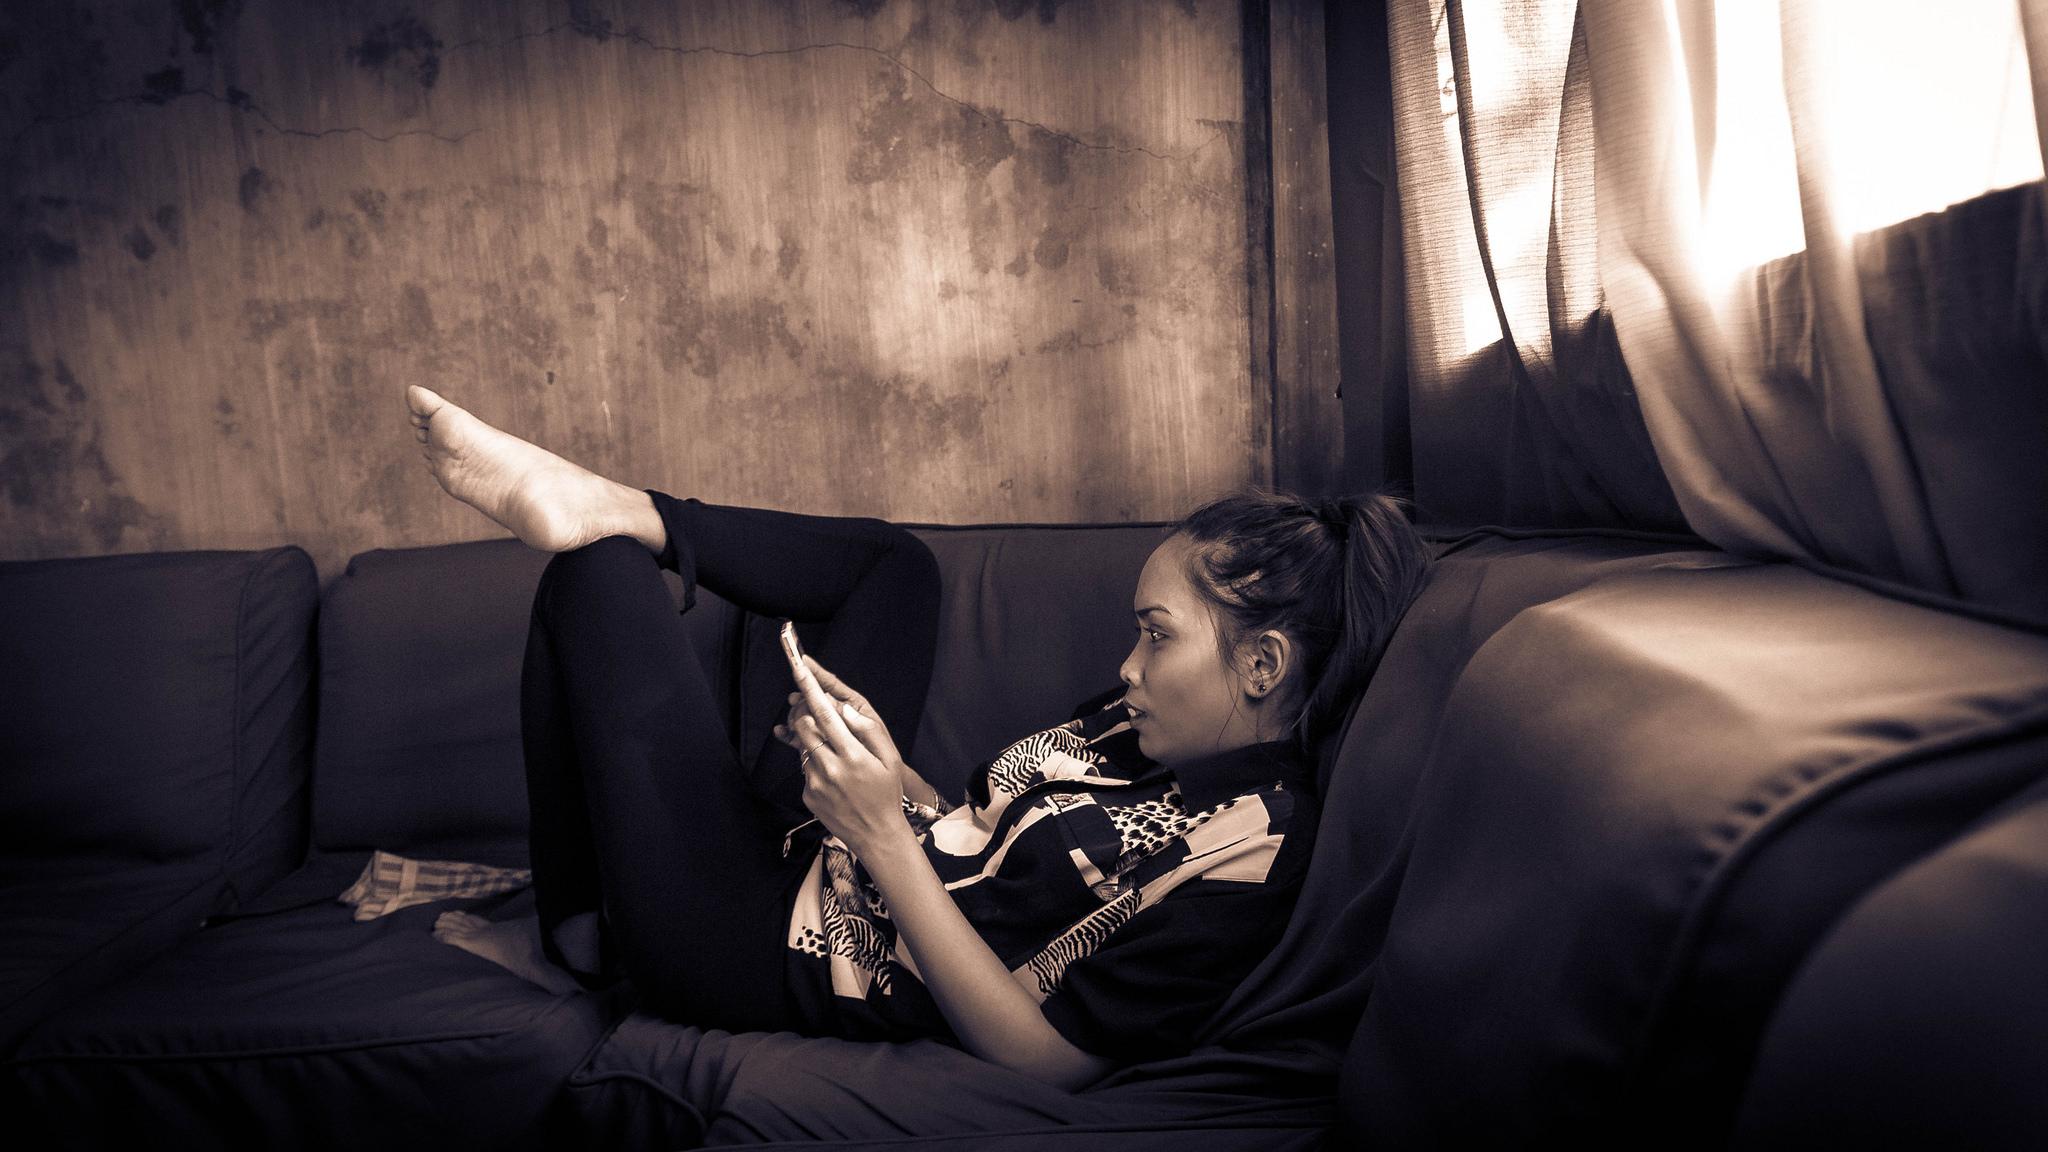 Smartphone by Yacine Petitprez.